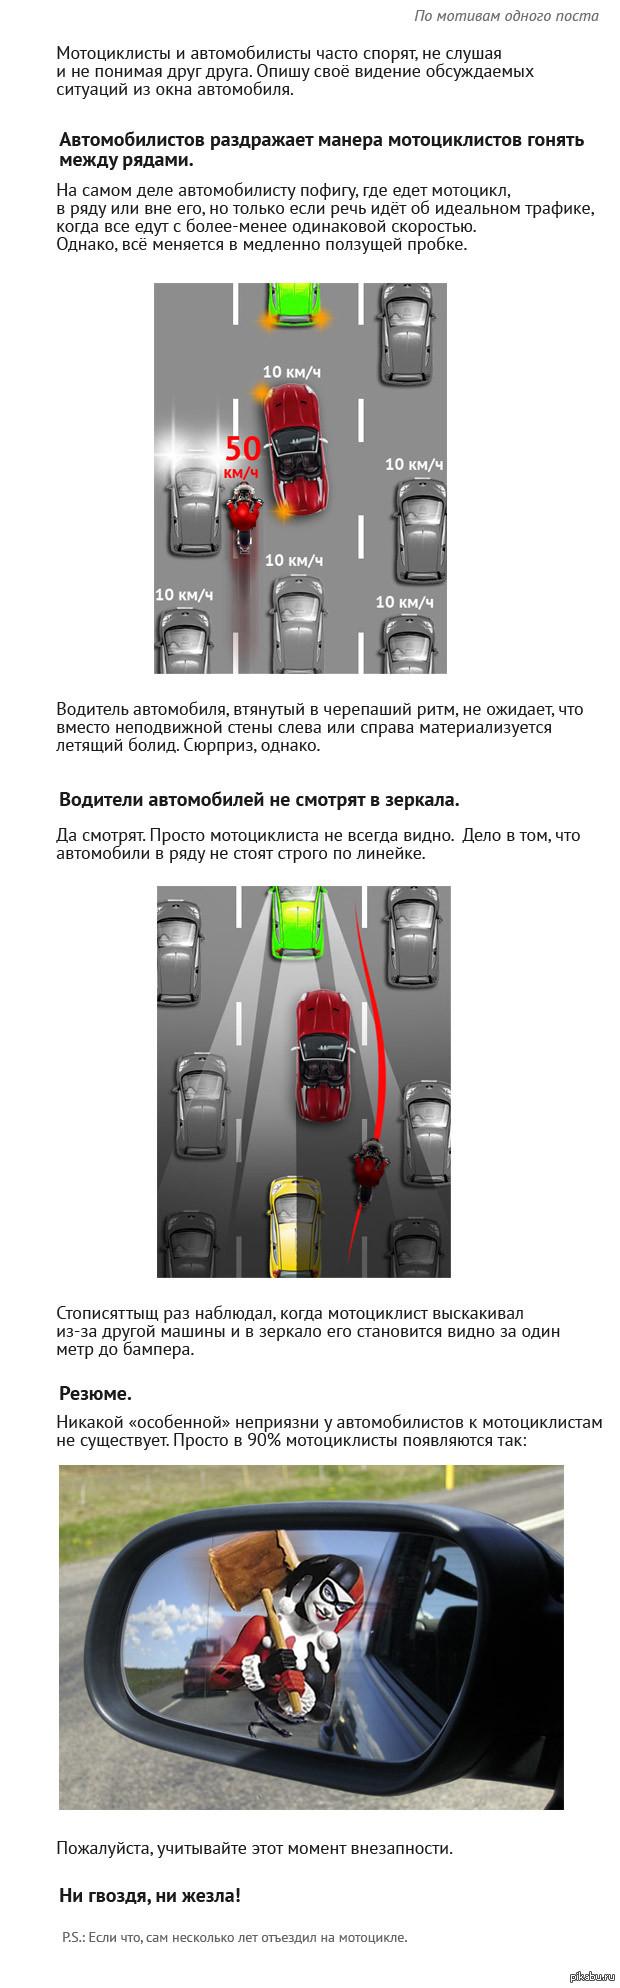 Мотоциклисты vs автомобилисты